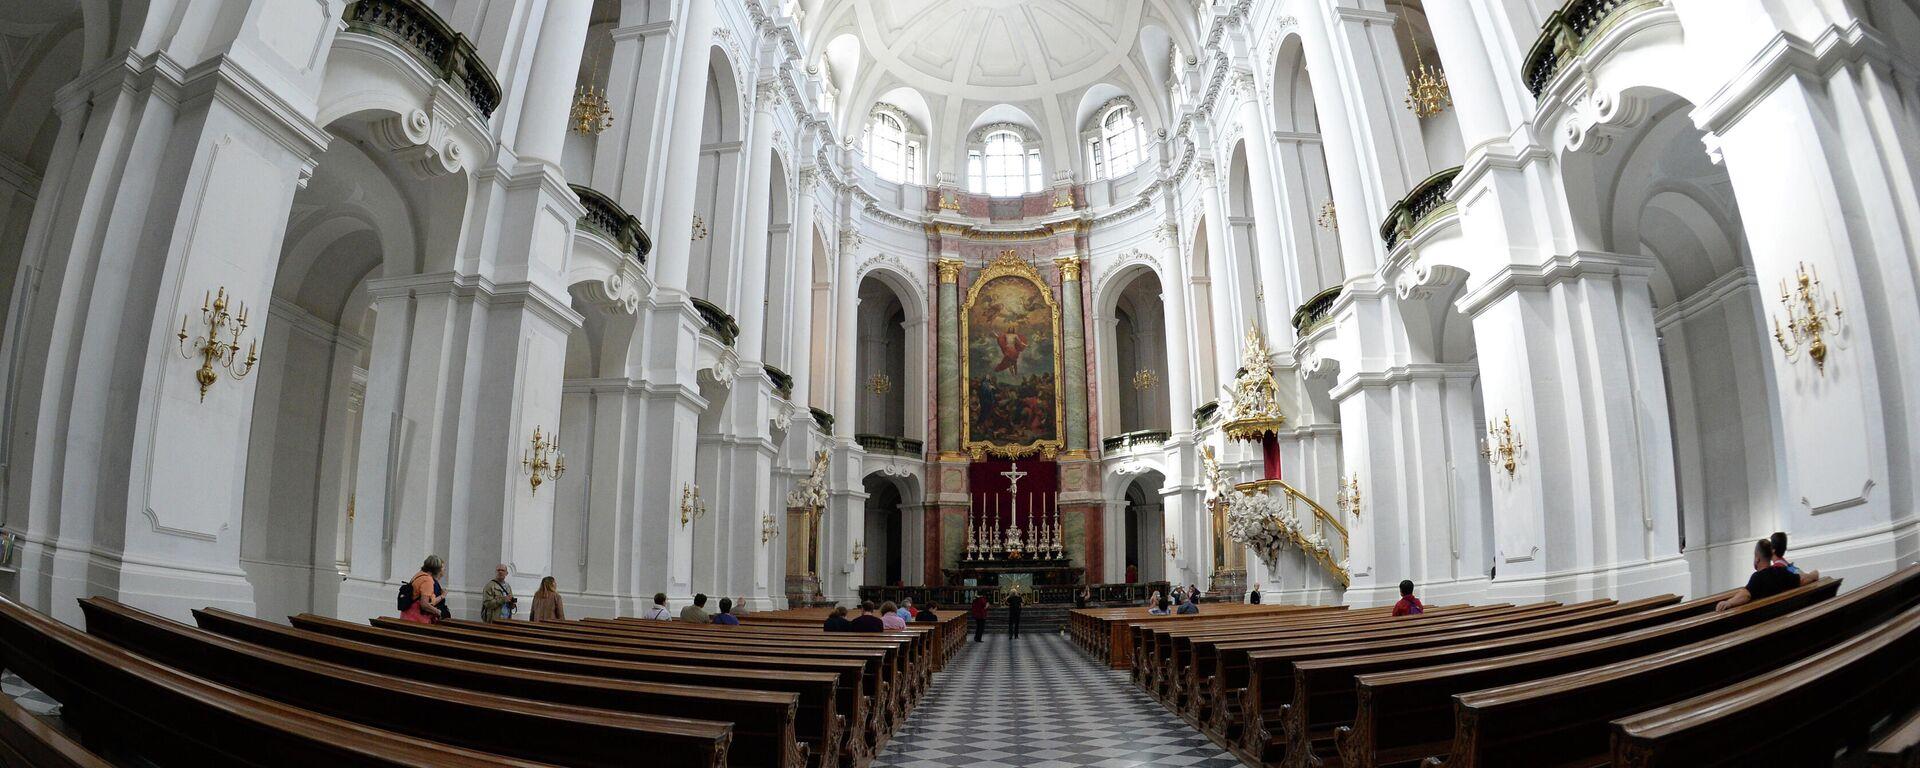 Katholische Hofkirche in Dresden (Archivbild) - SNA, 1920, 03.02.2021